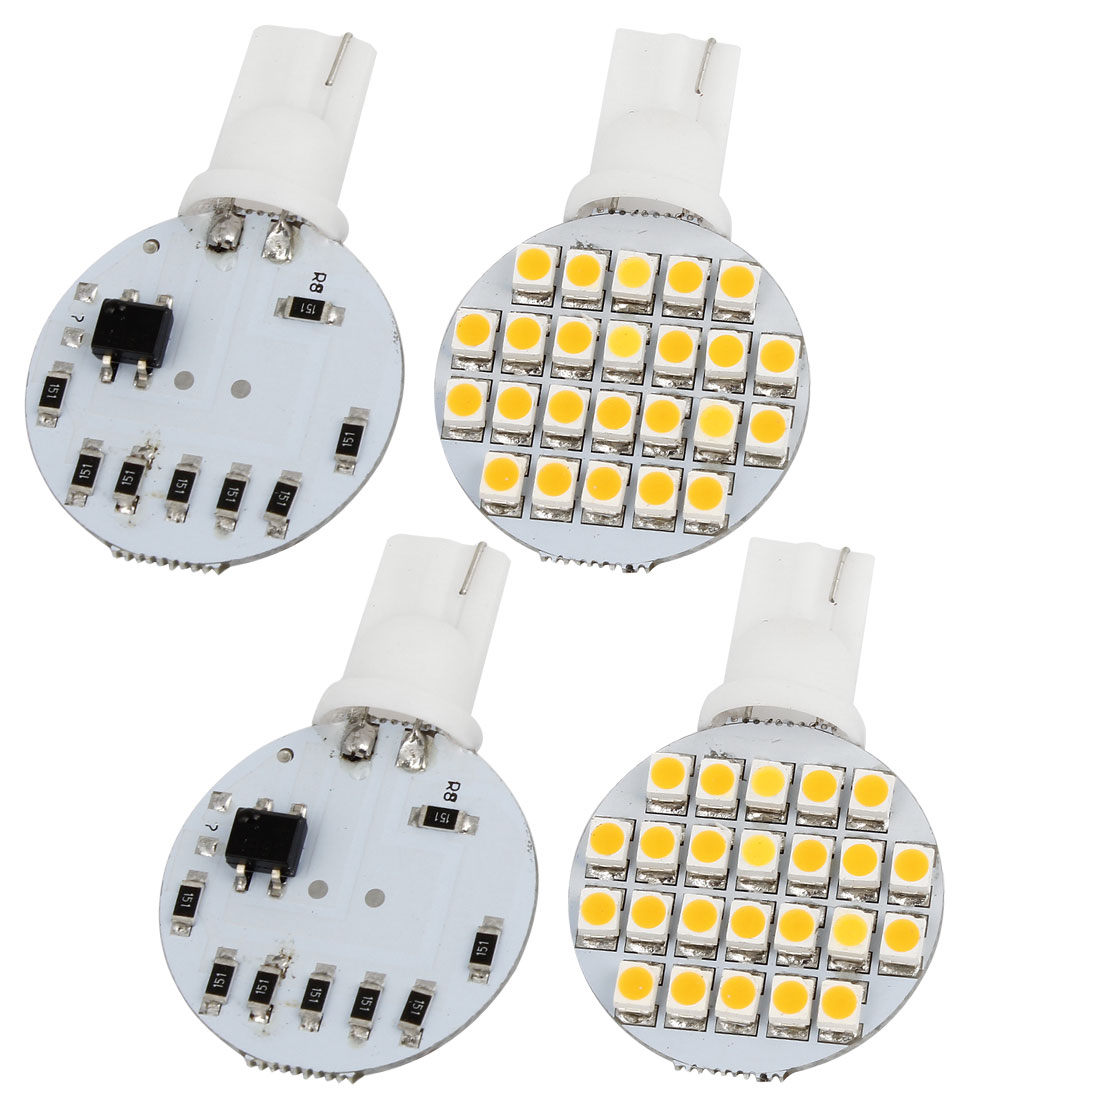 4 Pcs Auto Car T10 Warm White 1210 SMD 24 LED Light Side Lamp Bulbs Internal